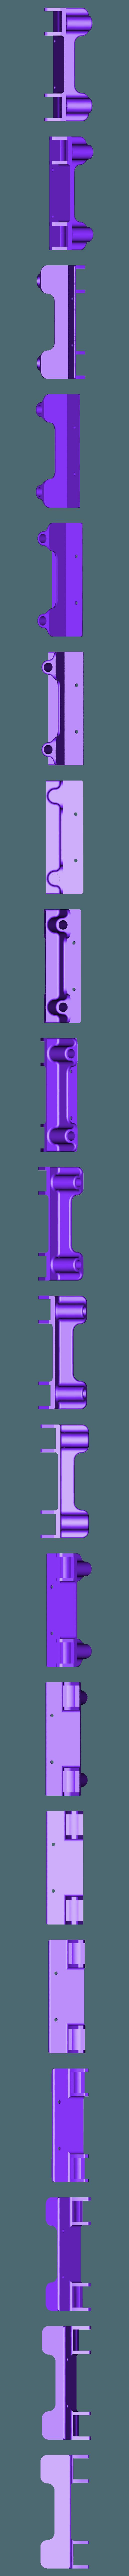 Base.stl Download free STL file Wheelie tote box kit • Model to 3D print, Sagittario